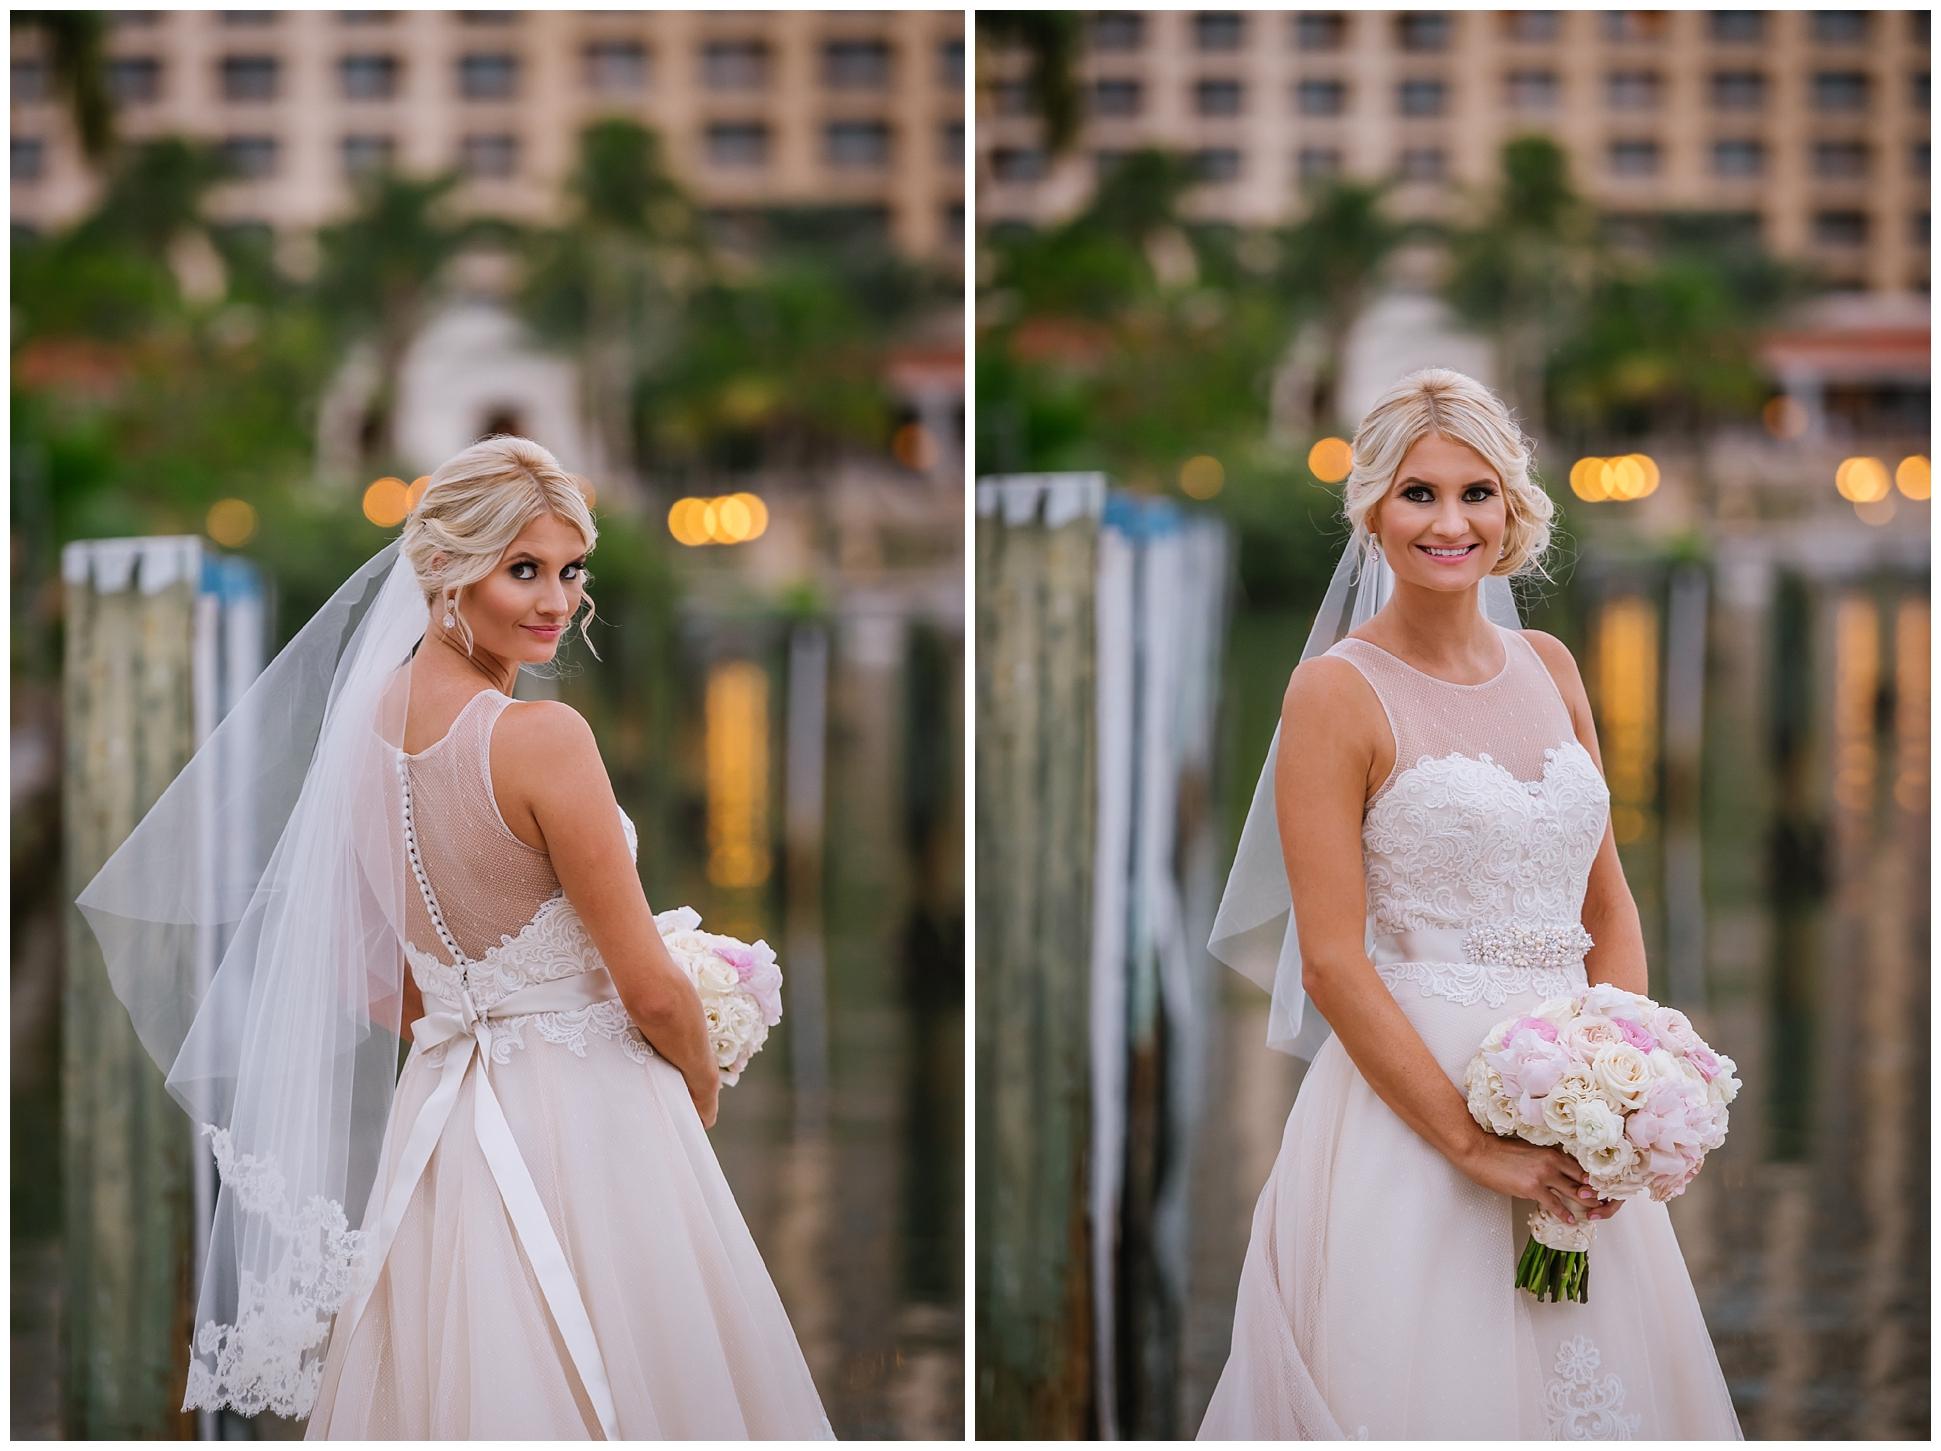 Sarasota-wedding-photographer-hyatt-regency-blush_0053.jpg